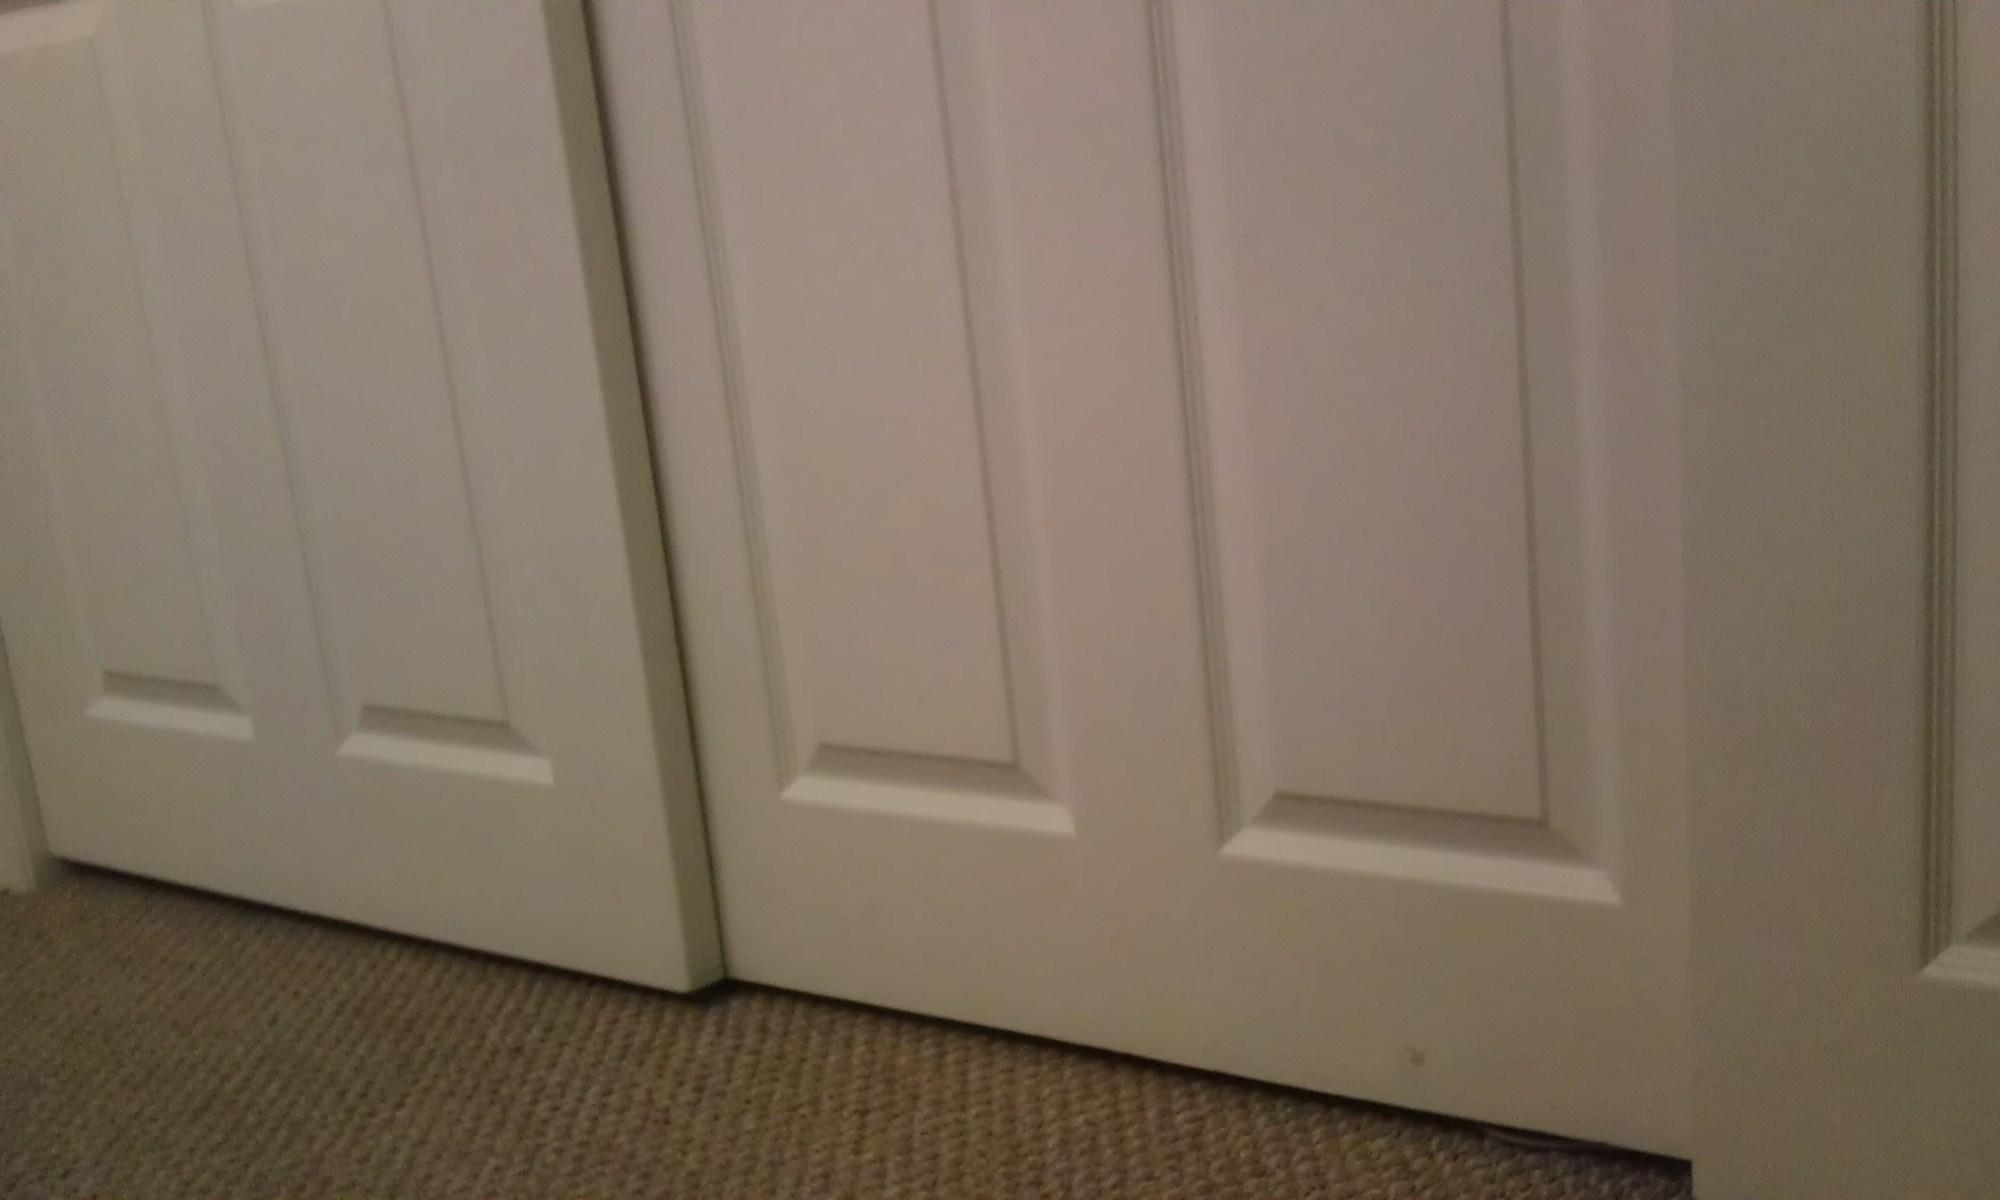 A closet for a diabetic cat to explore